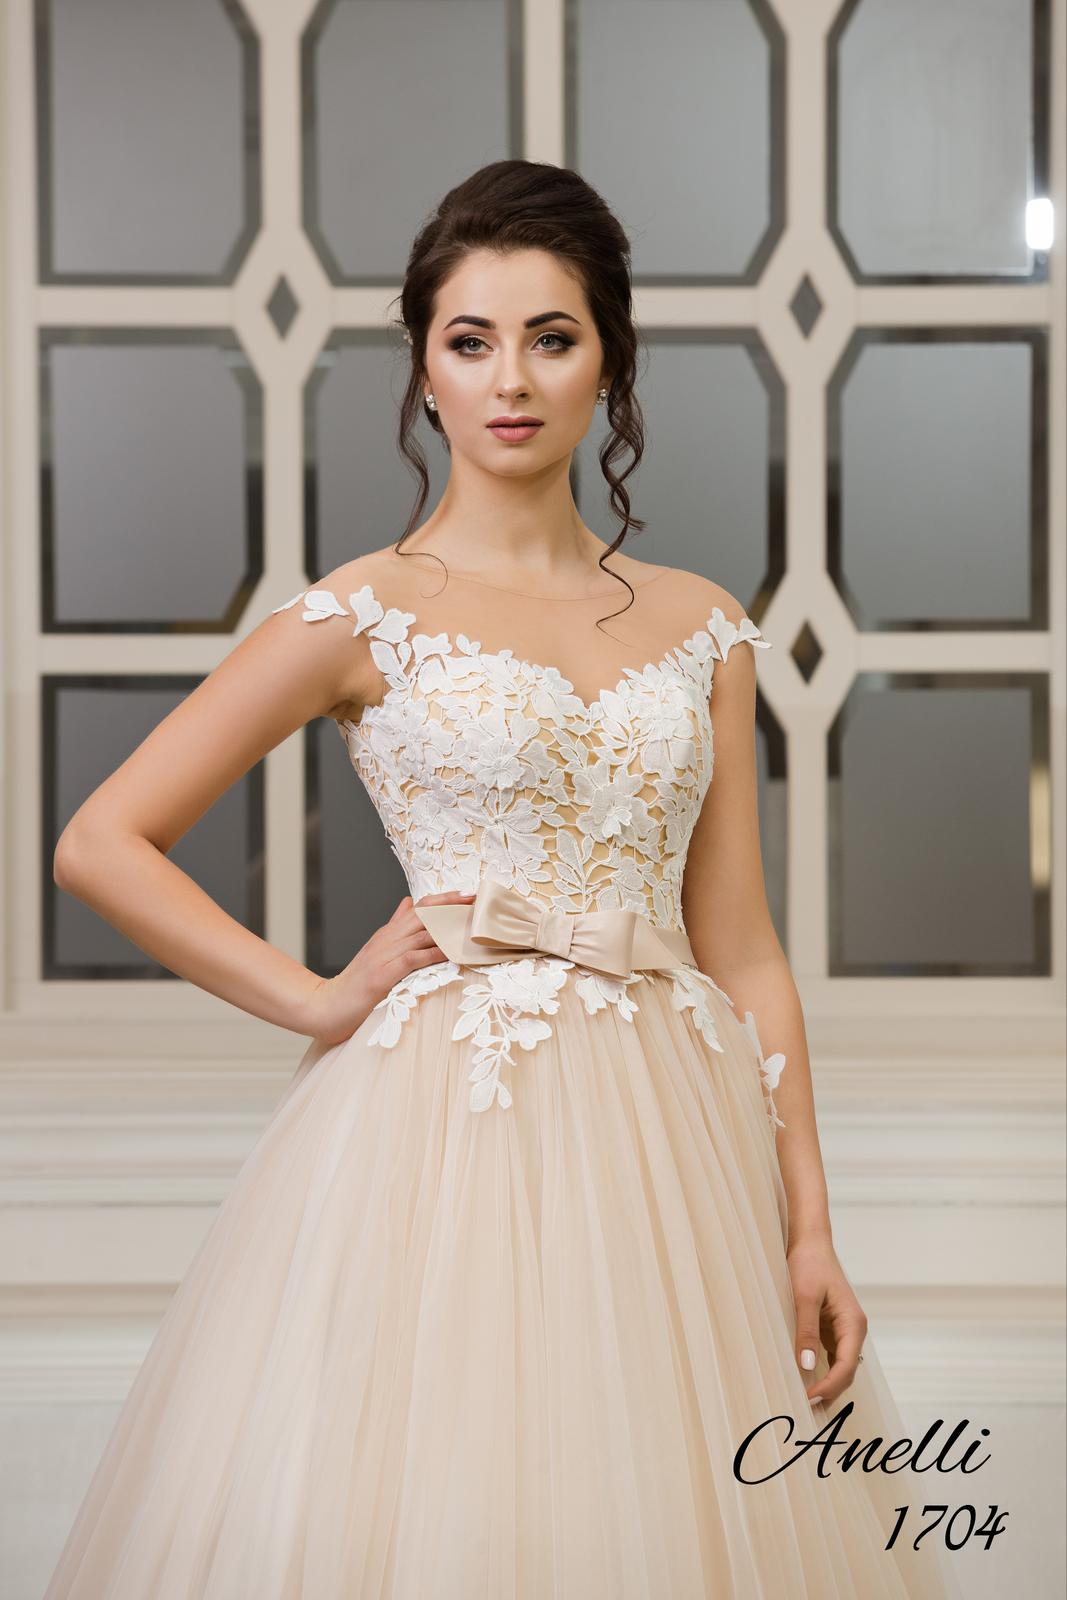 Svadobné šaty - Debut 1704 - Obrázok č. 1